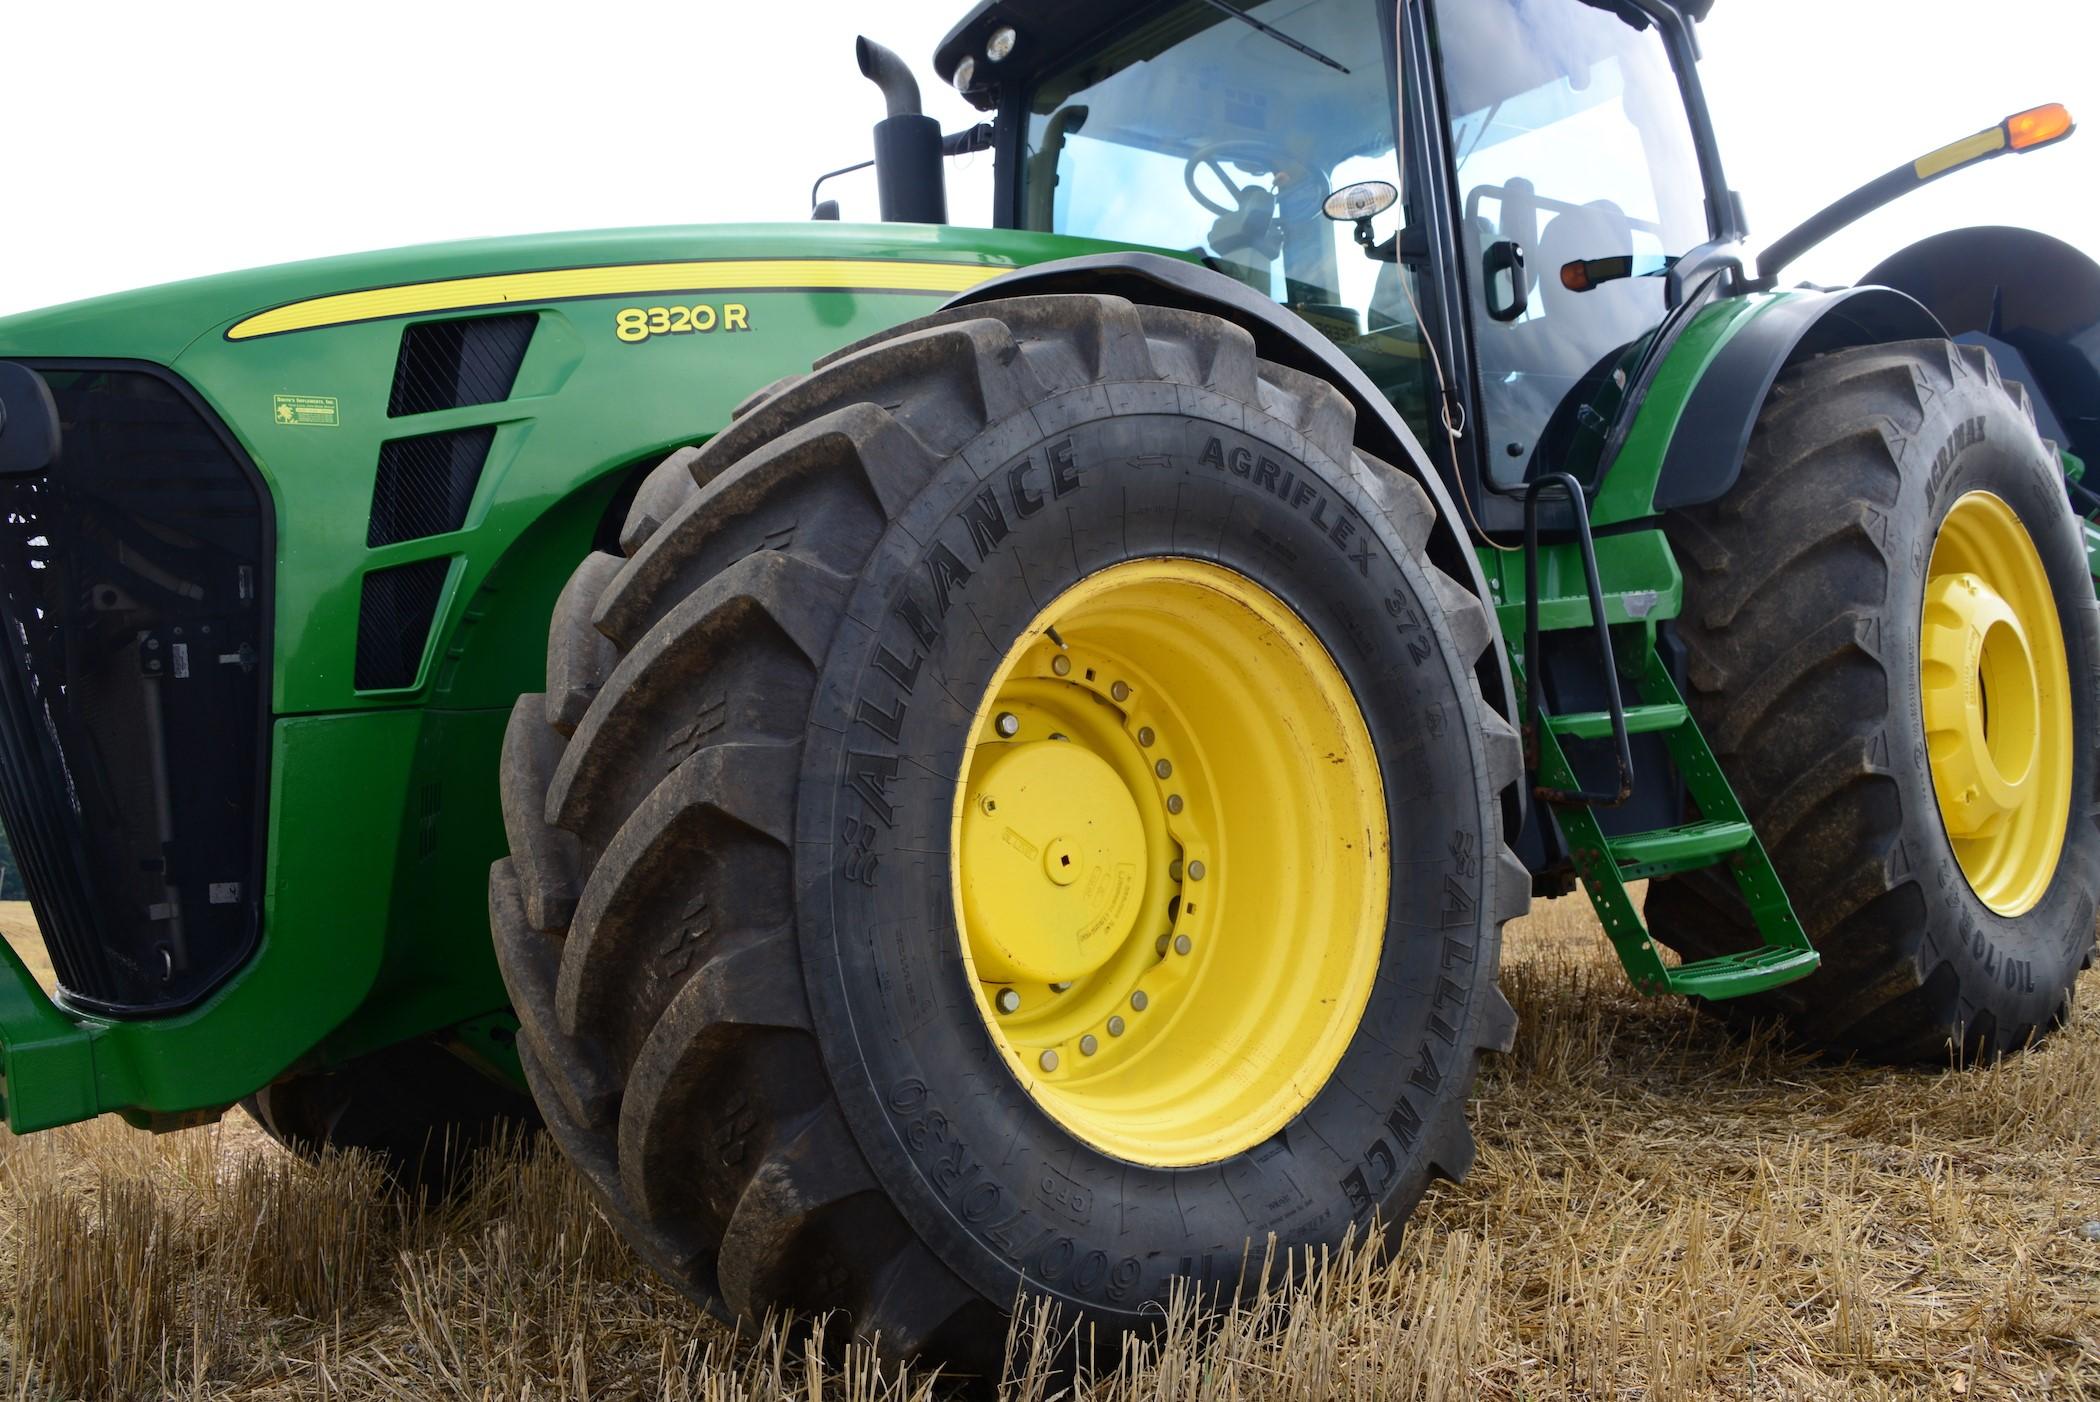 Alliance AgriFlex 372 Tractor Tire